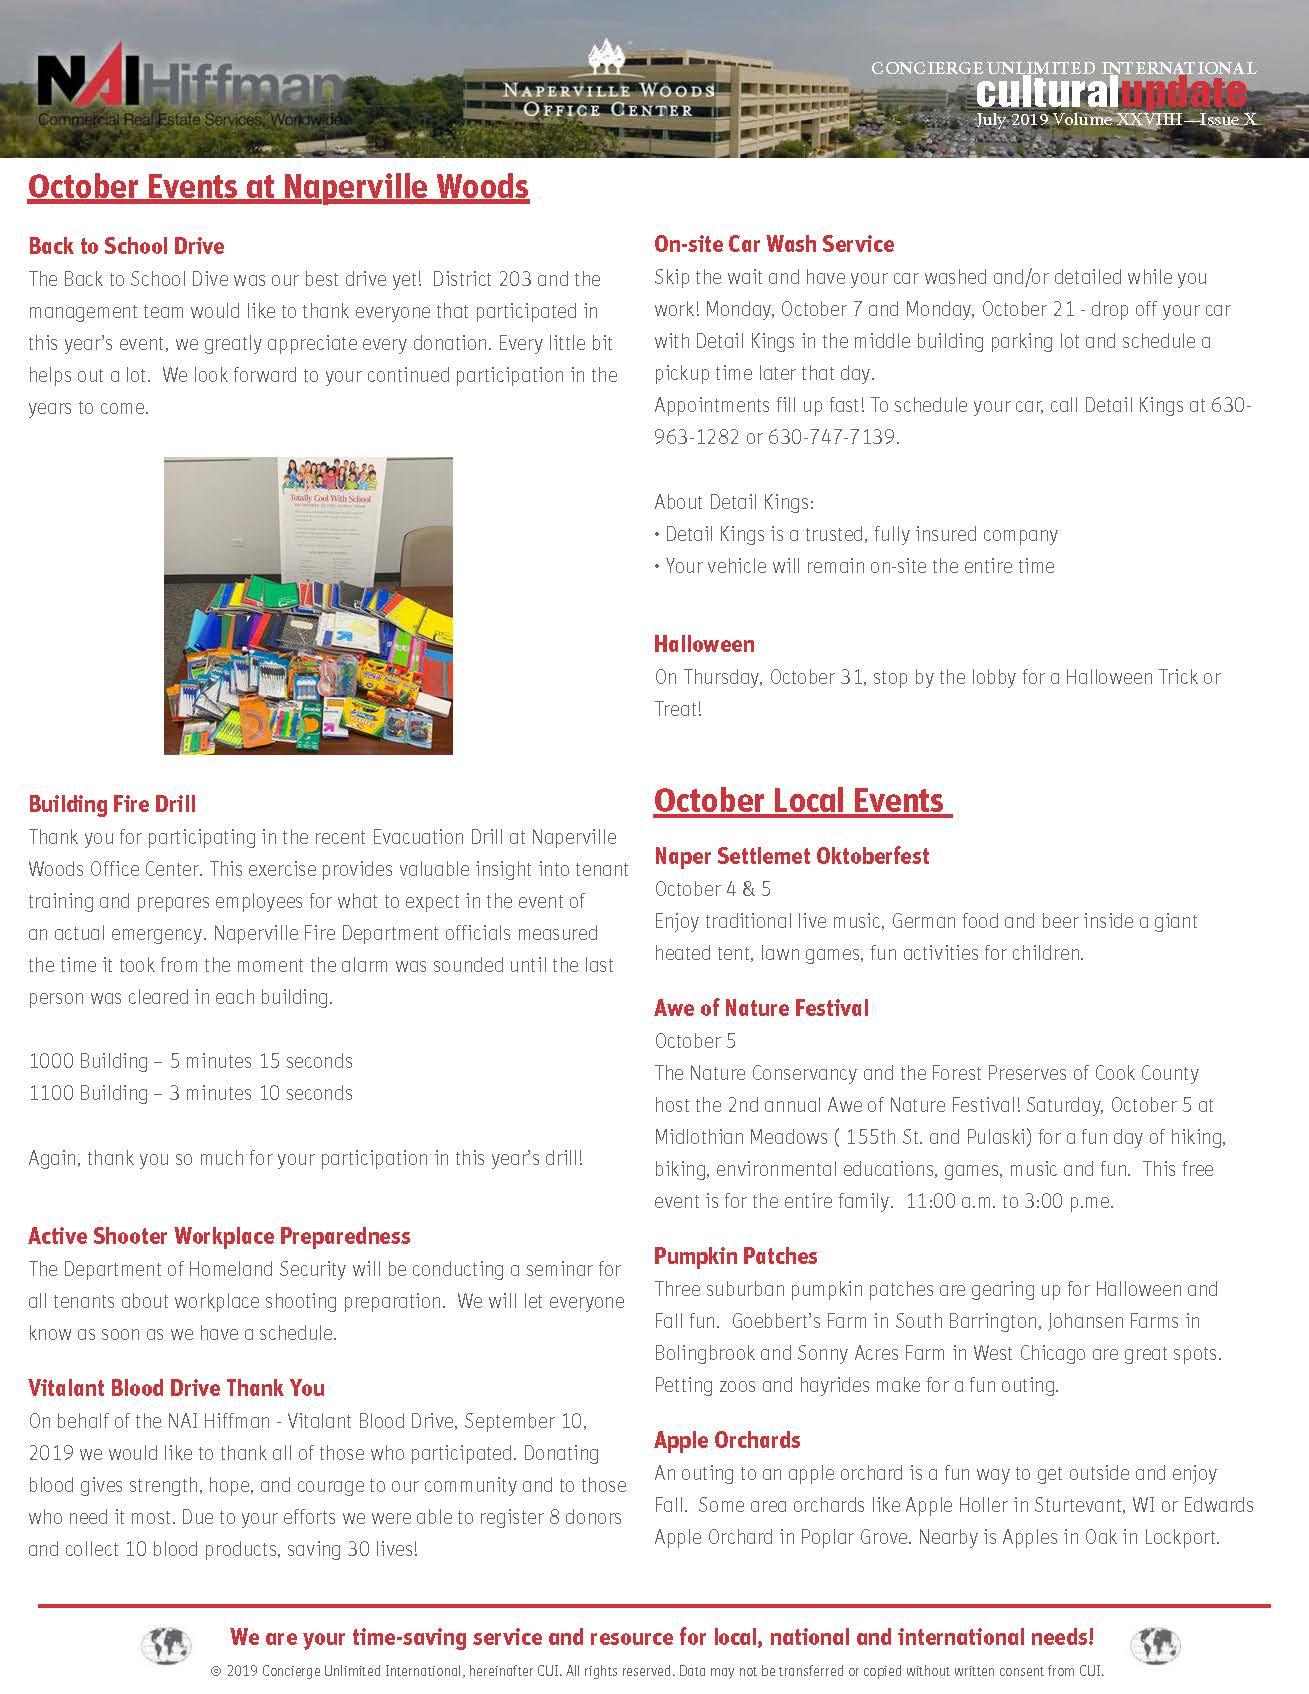 NWOC - October Cultural Update_Page_1.jpg